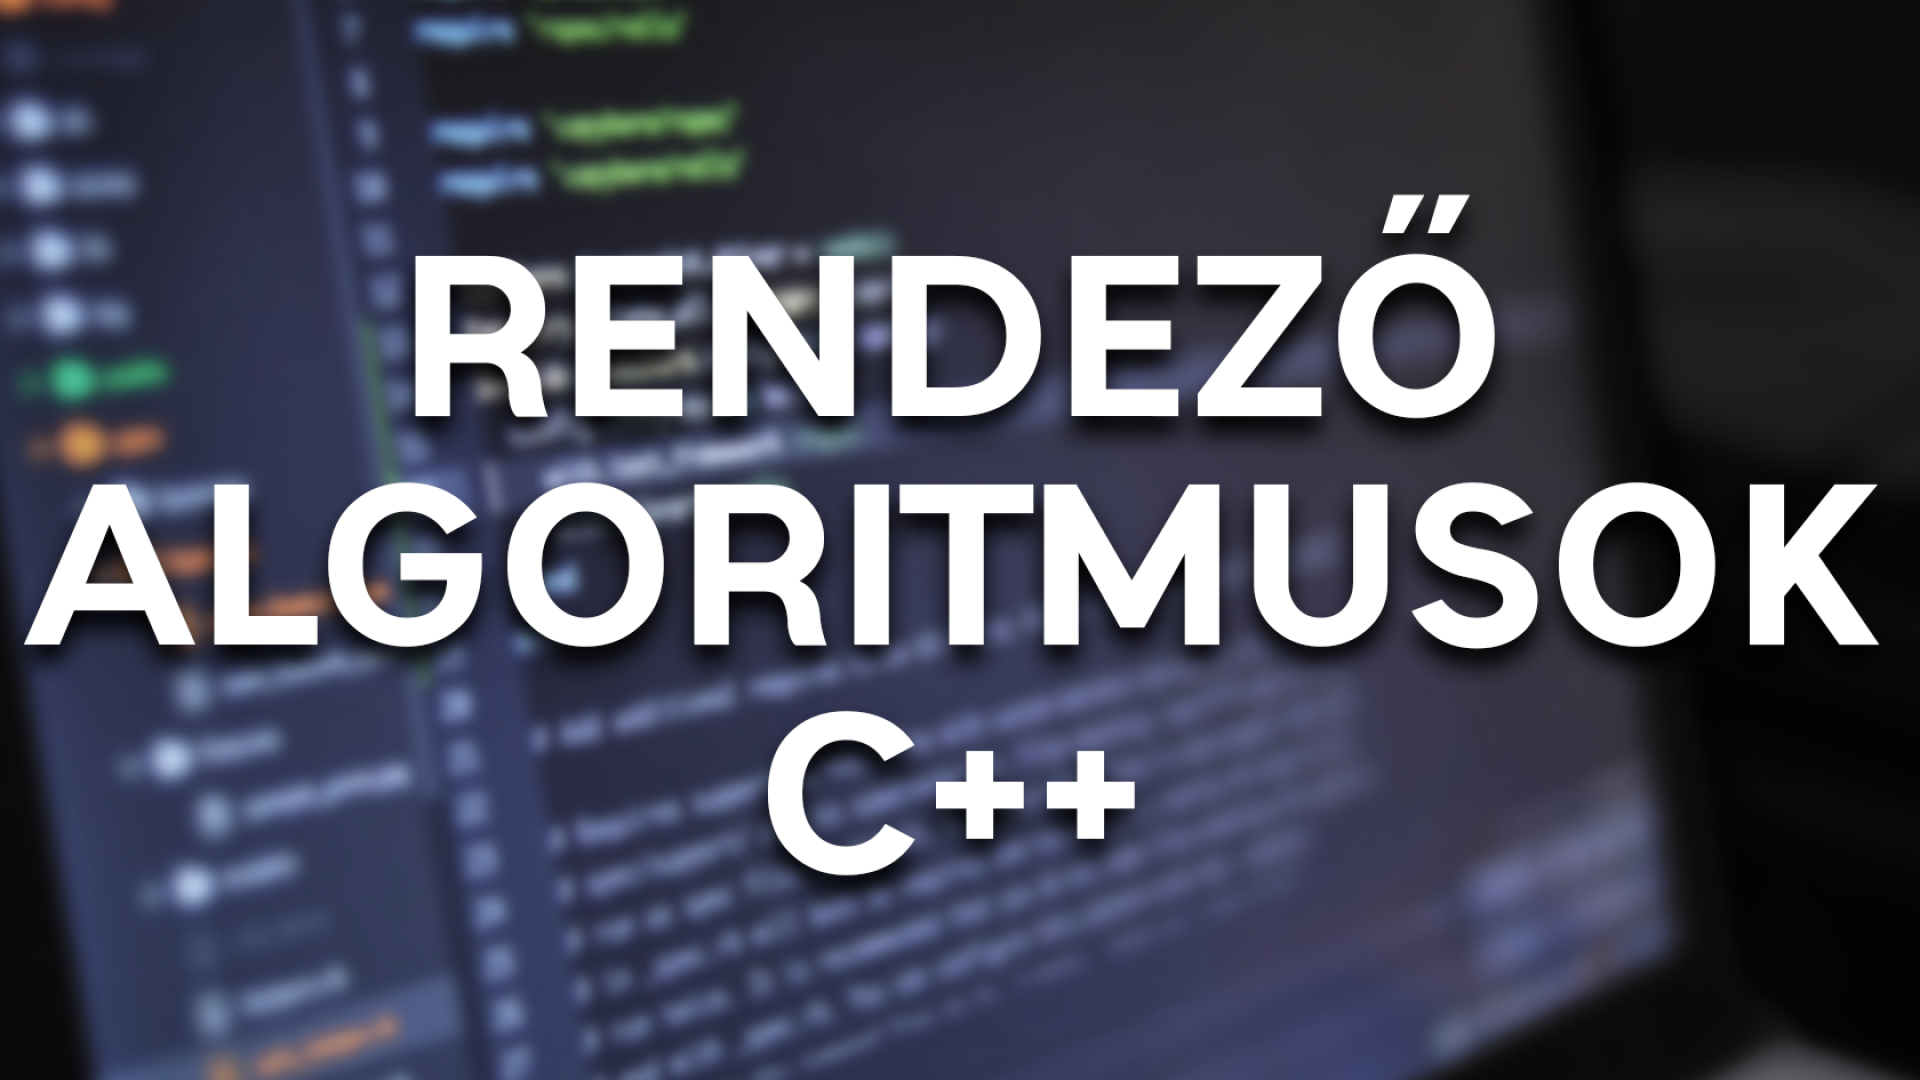 Rendező Algoritmusok - C++